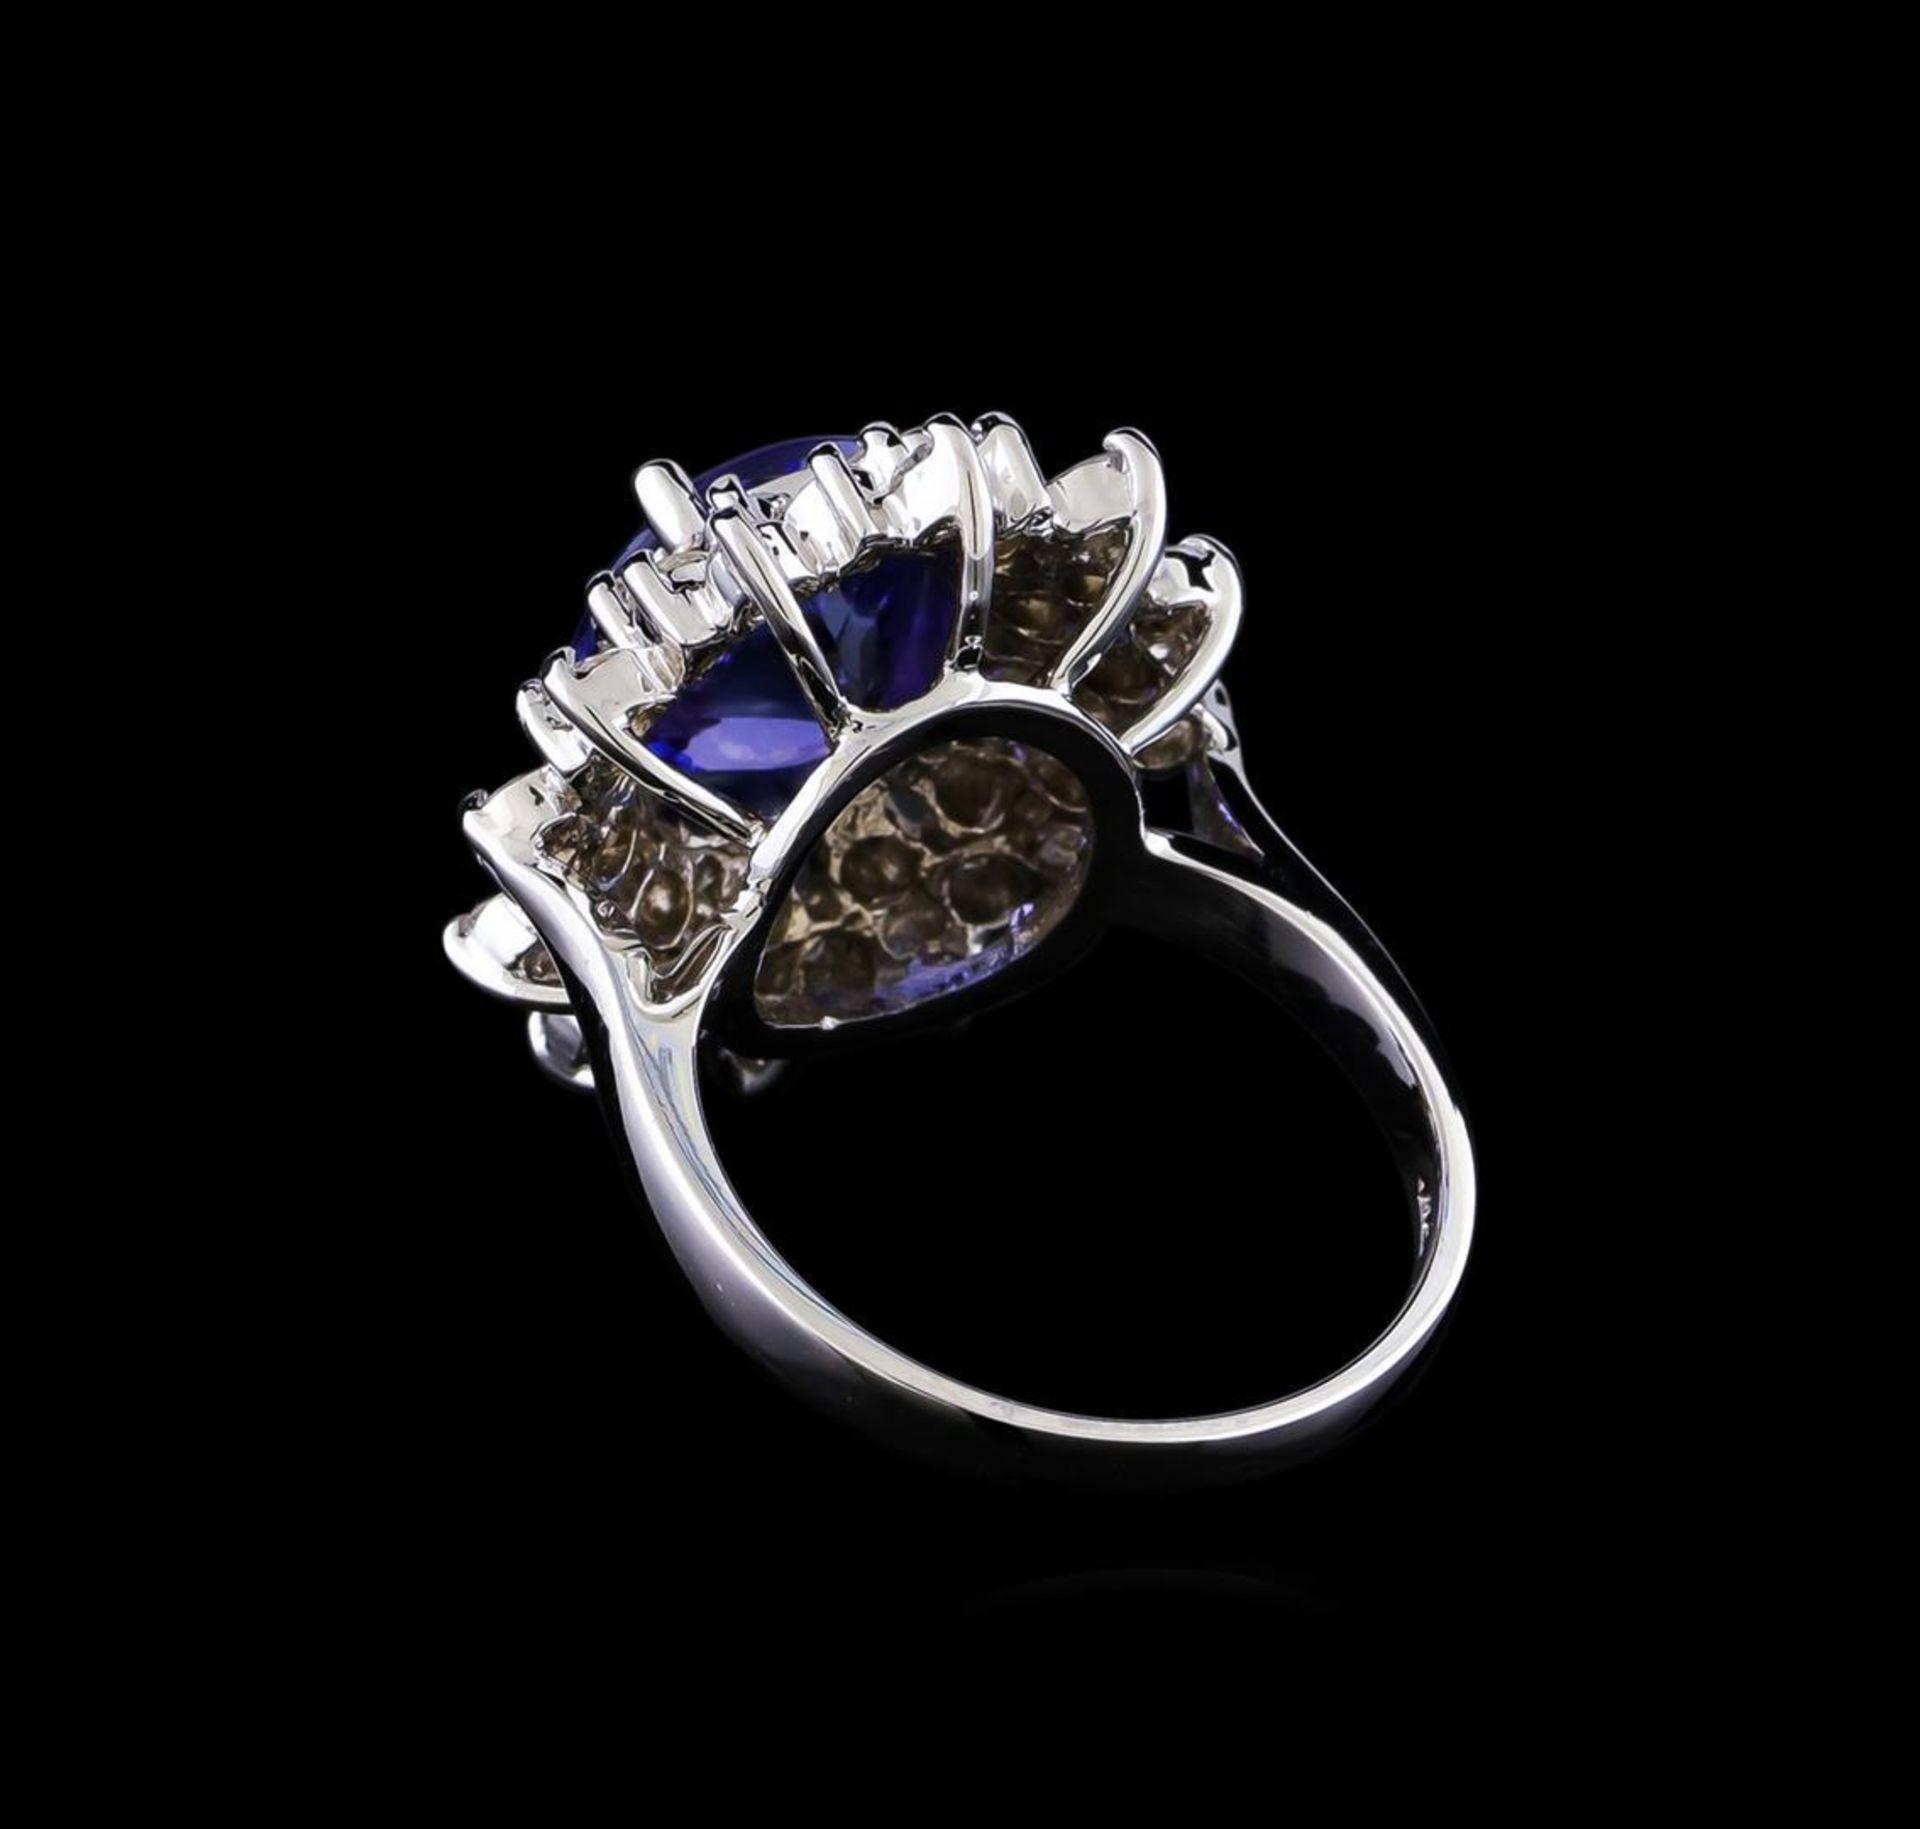 4.01 ctw Tanzanite and Diamond Ring - 14KT White Gold - Image 3 of 5